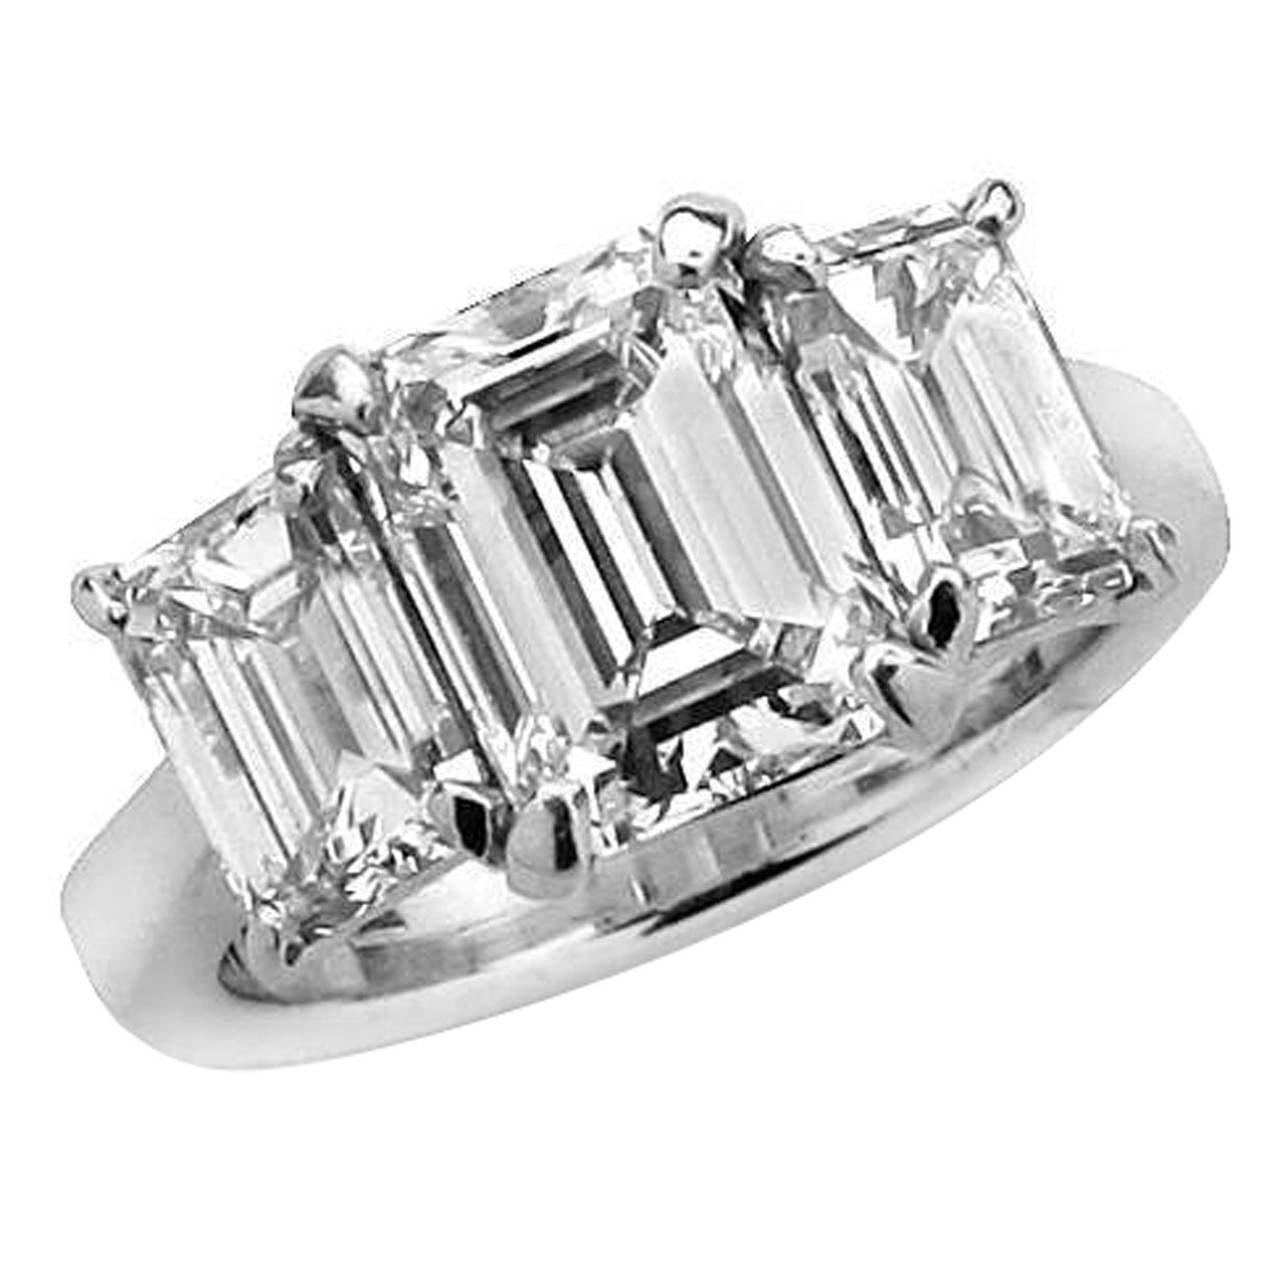 GIA Certified 2.45 Carat Emerald Cut Diamond Engagement Ring